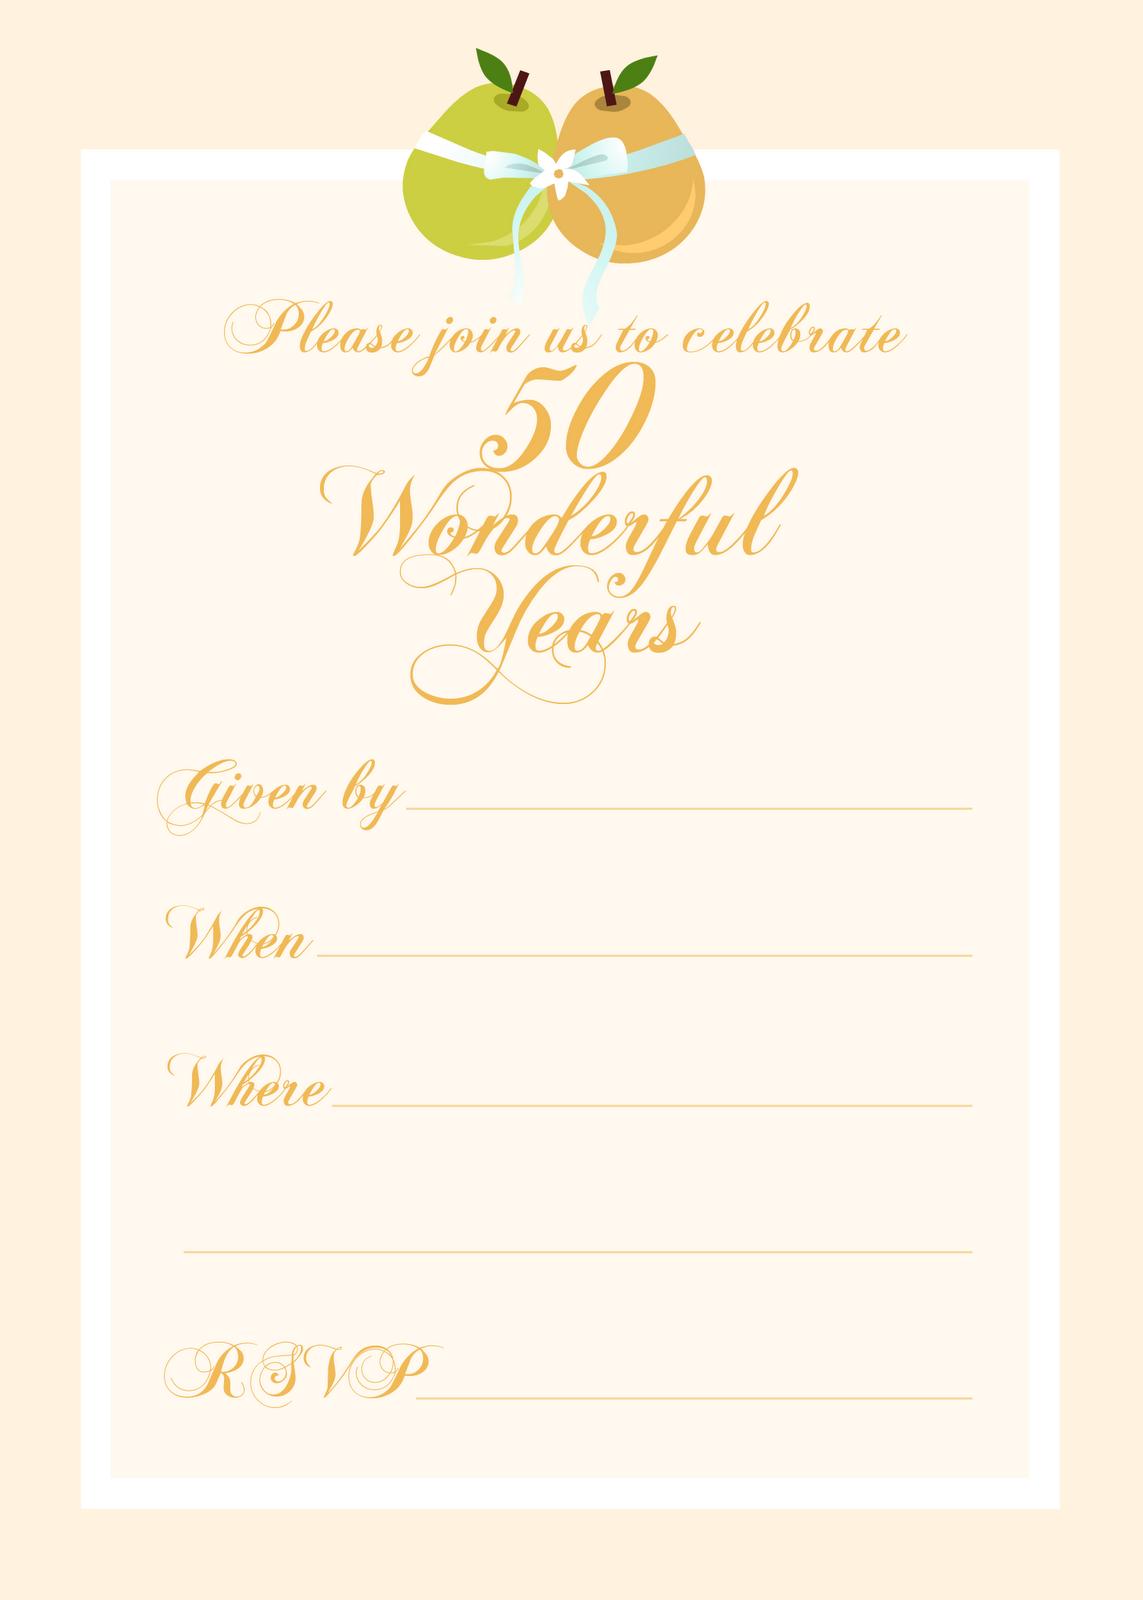 Free Printable Ruby Wedding Anniversary Invitations K Wallpapers - 40th wedding anniversary invitation templates